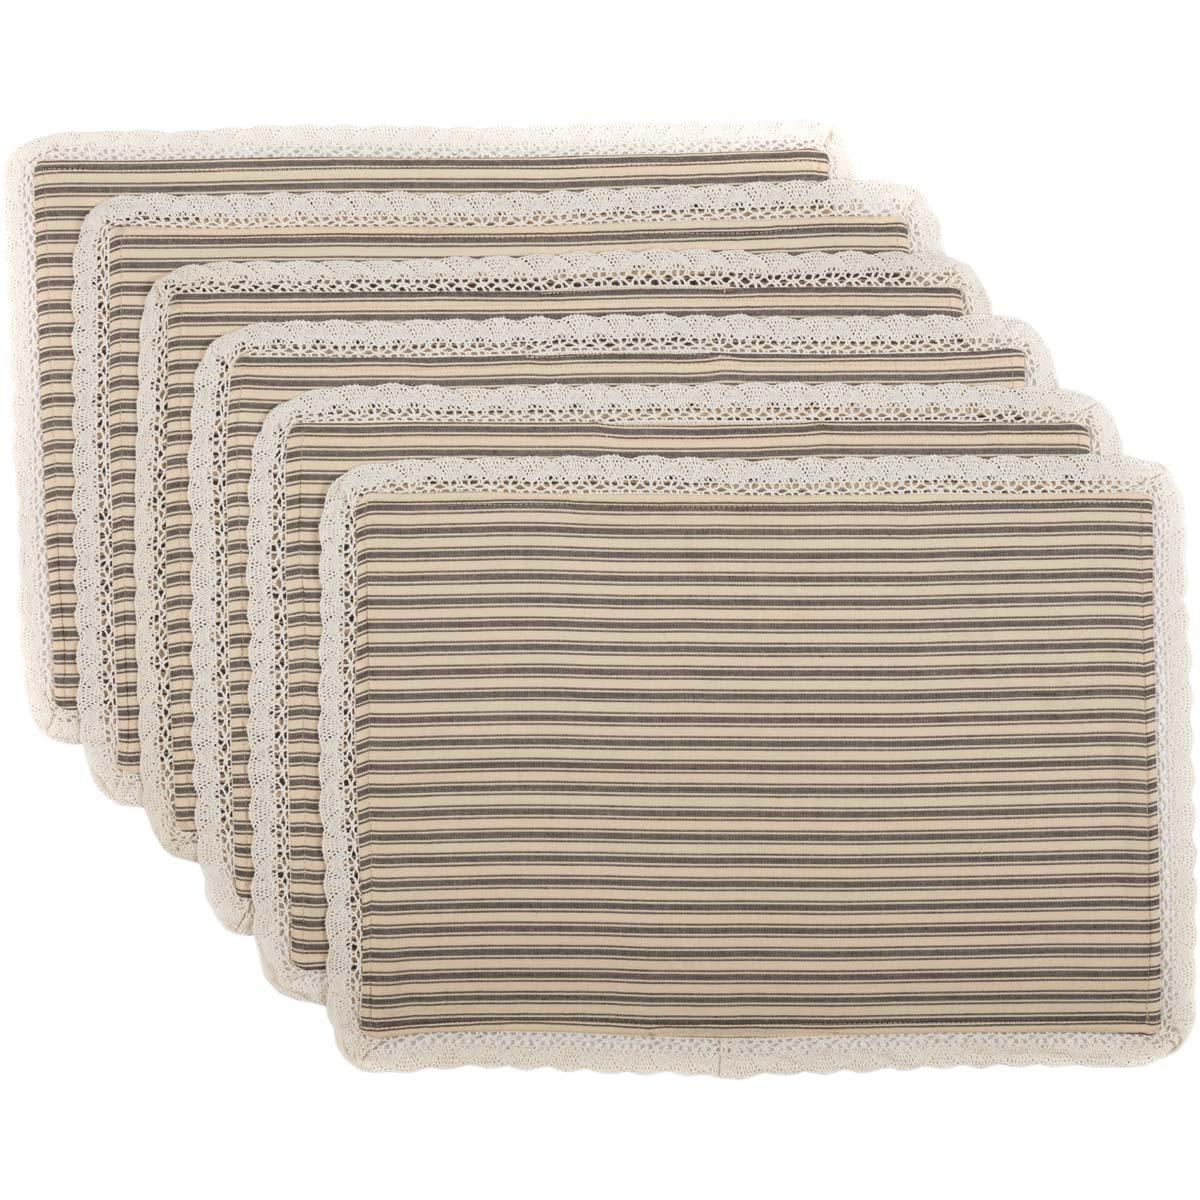 Kendra Stripe Black Placemat Set of 6 12x18